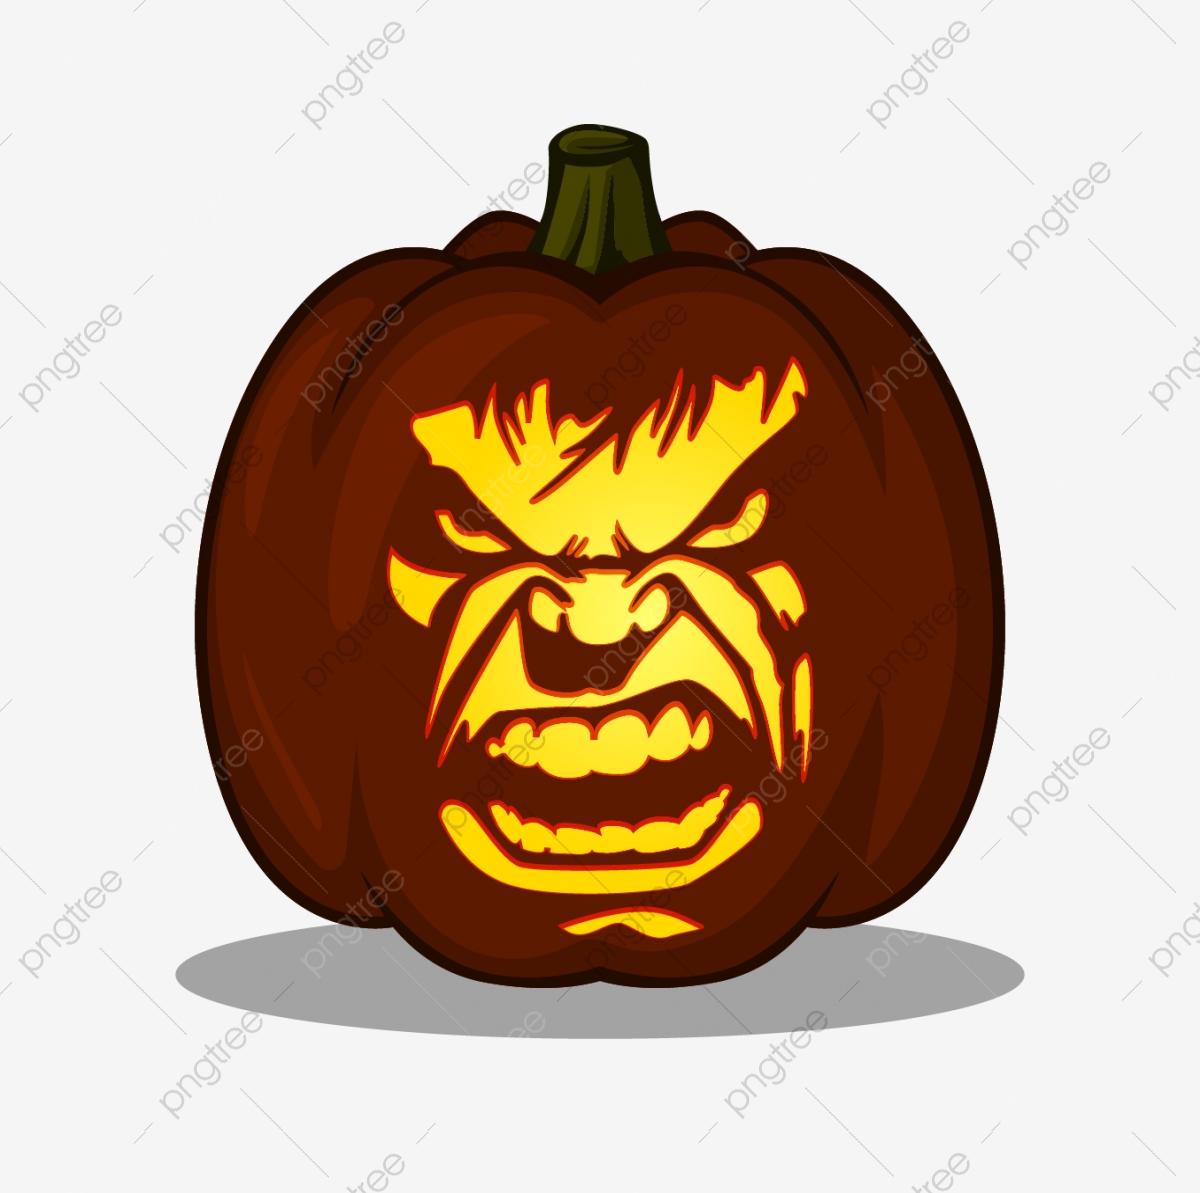 pumpkin template hulk  Hulk Design For Pumpkin Carving Ideas Include Pdf File Ready ...